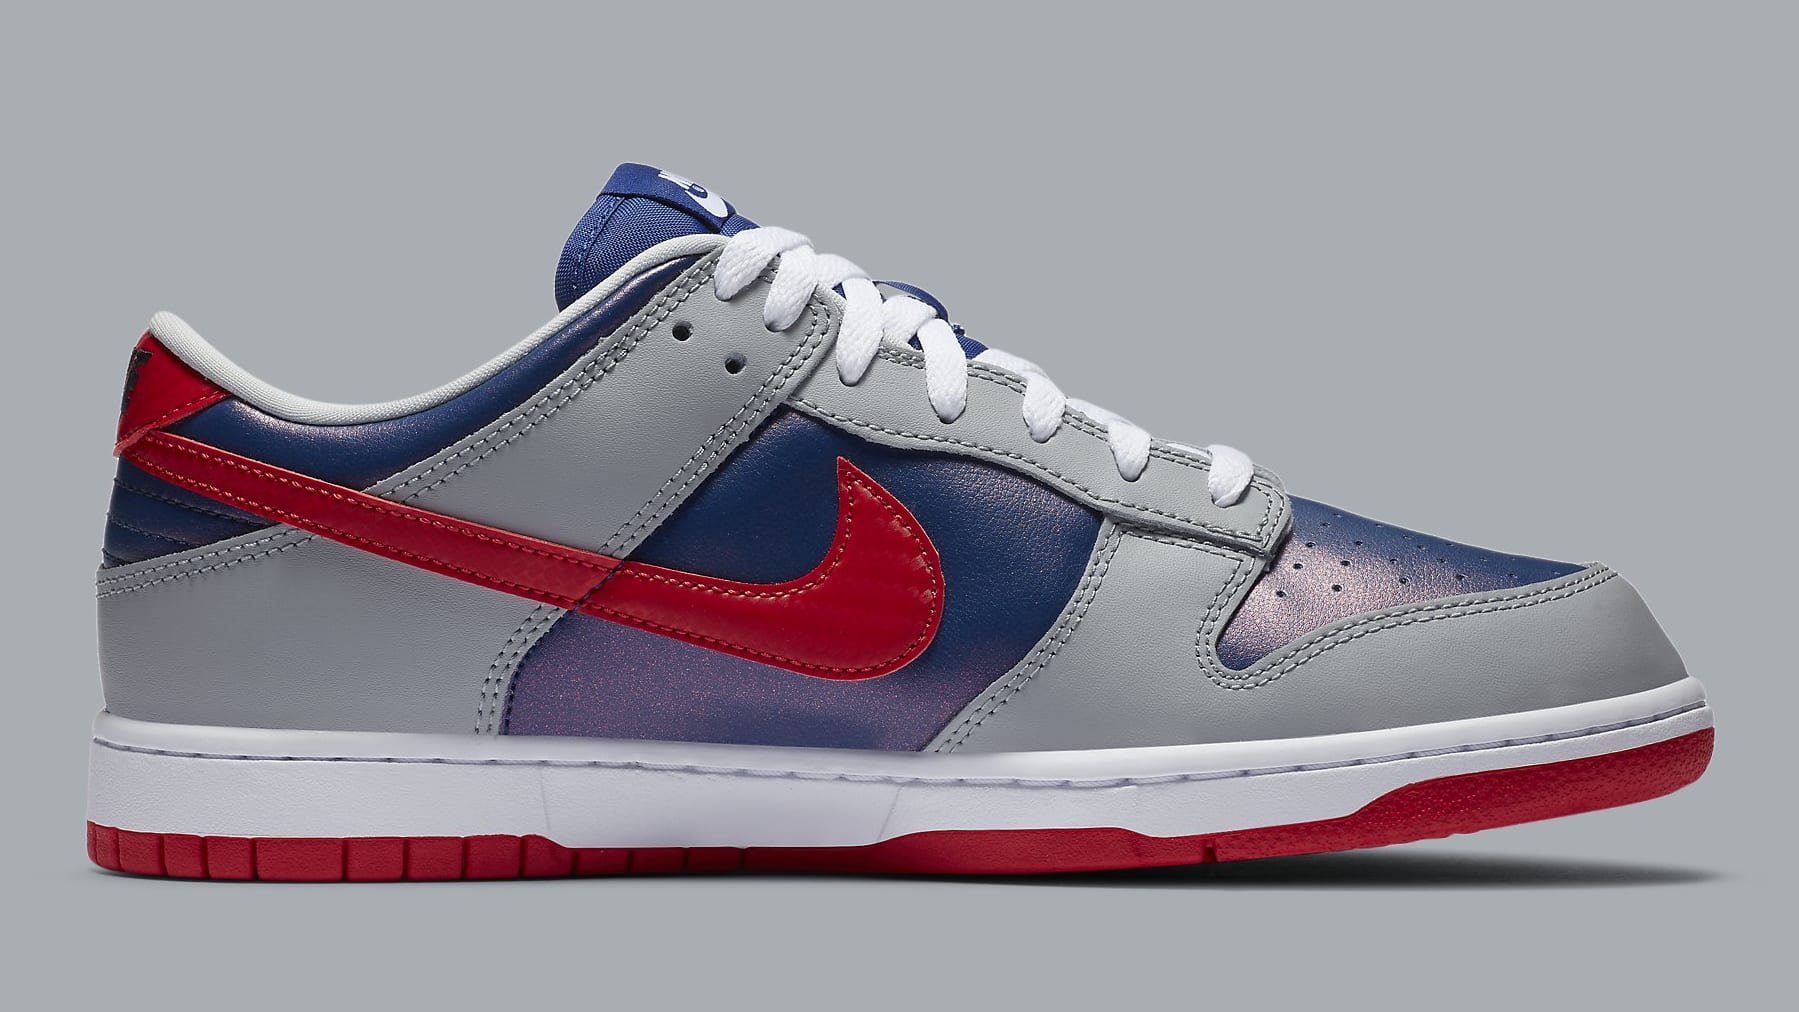 Nike Dunk Low Samba Release Date CZ2667-400 Medial